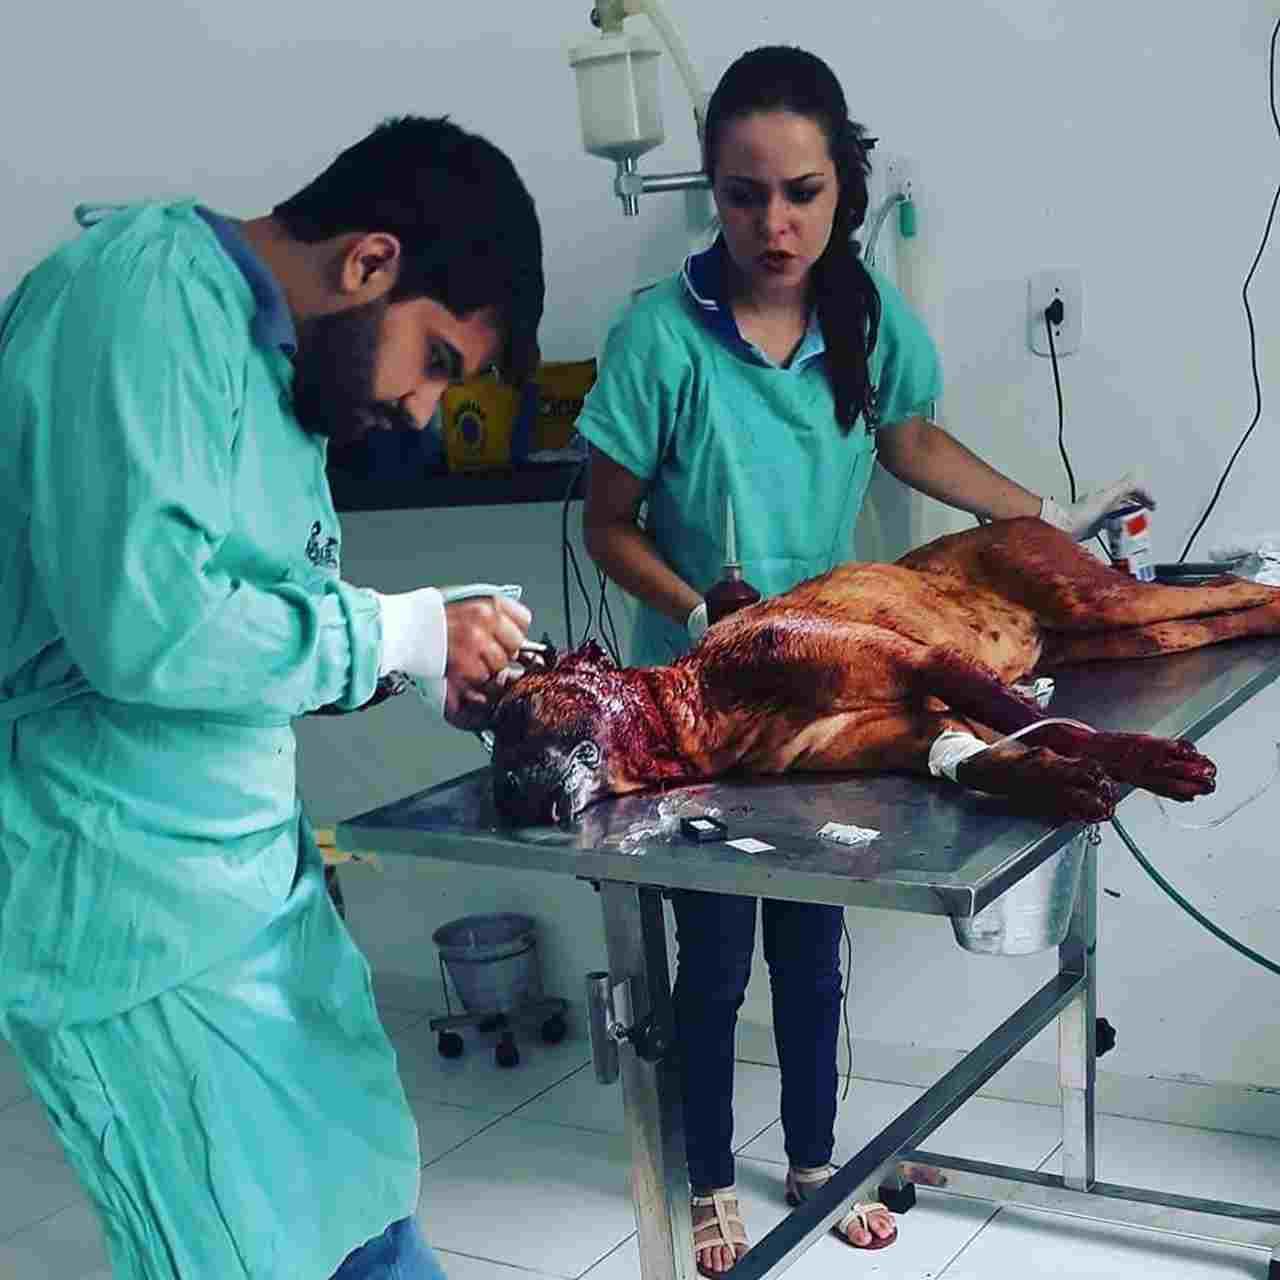 Safira precisou passar por atendimento veterinário após ser ferida gravemente | Foto: ONG Socorro Animal